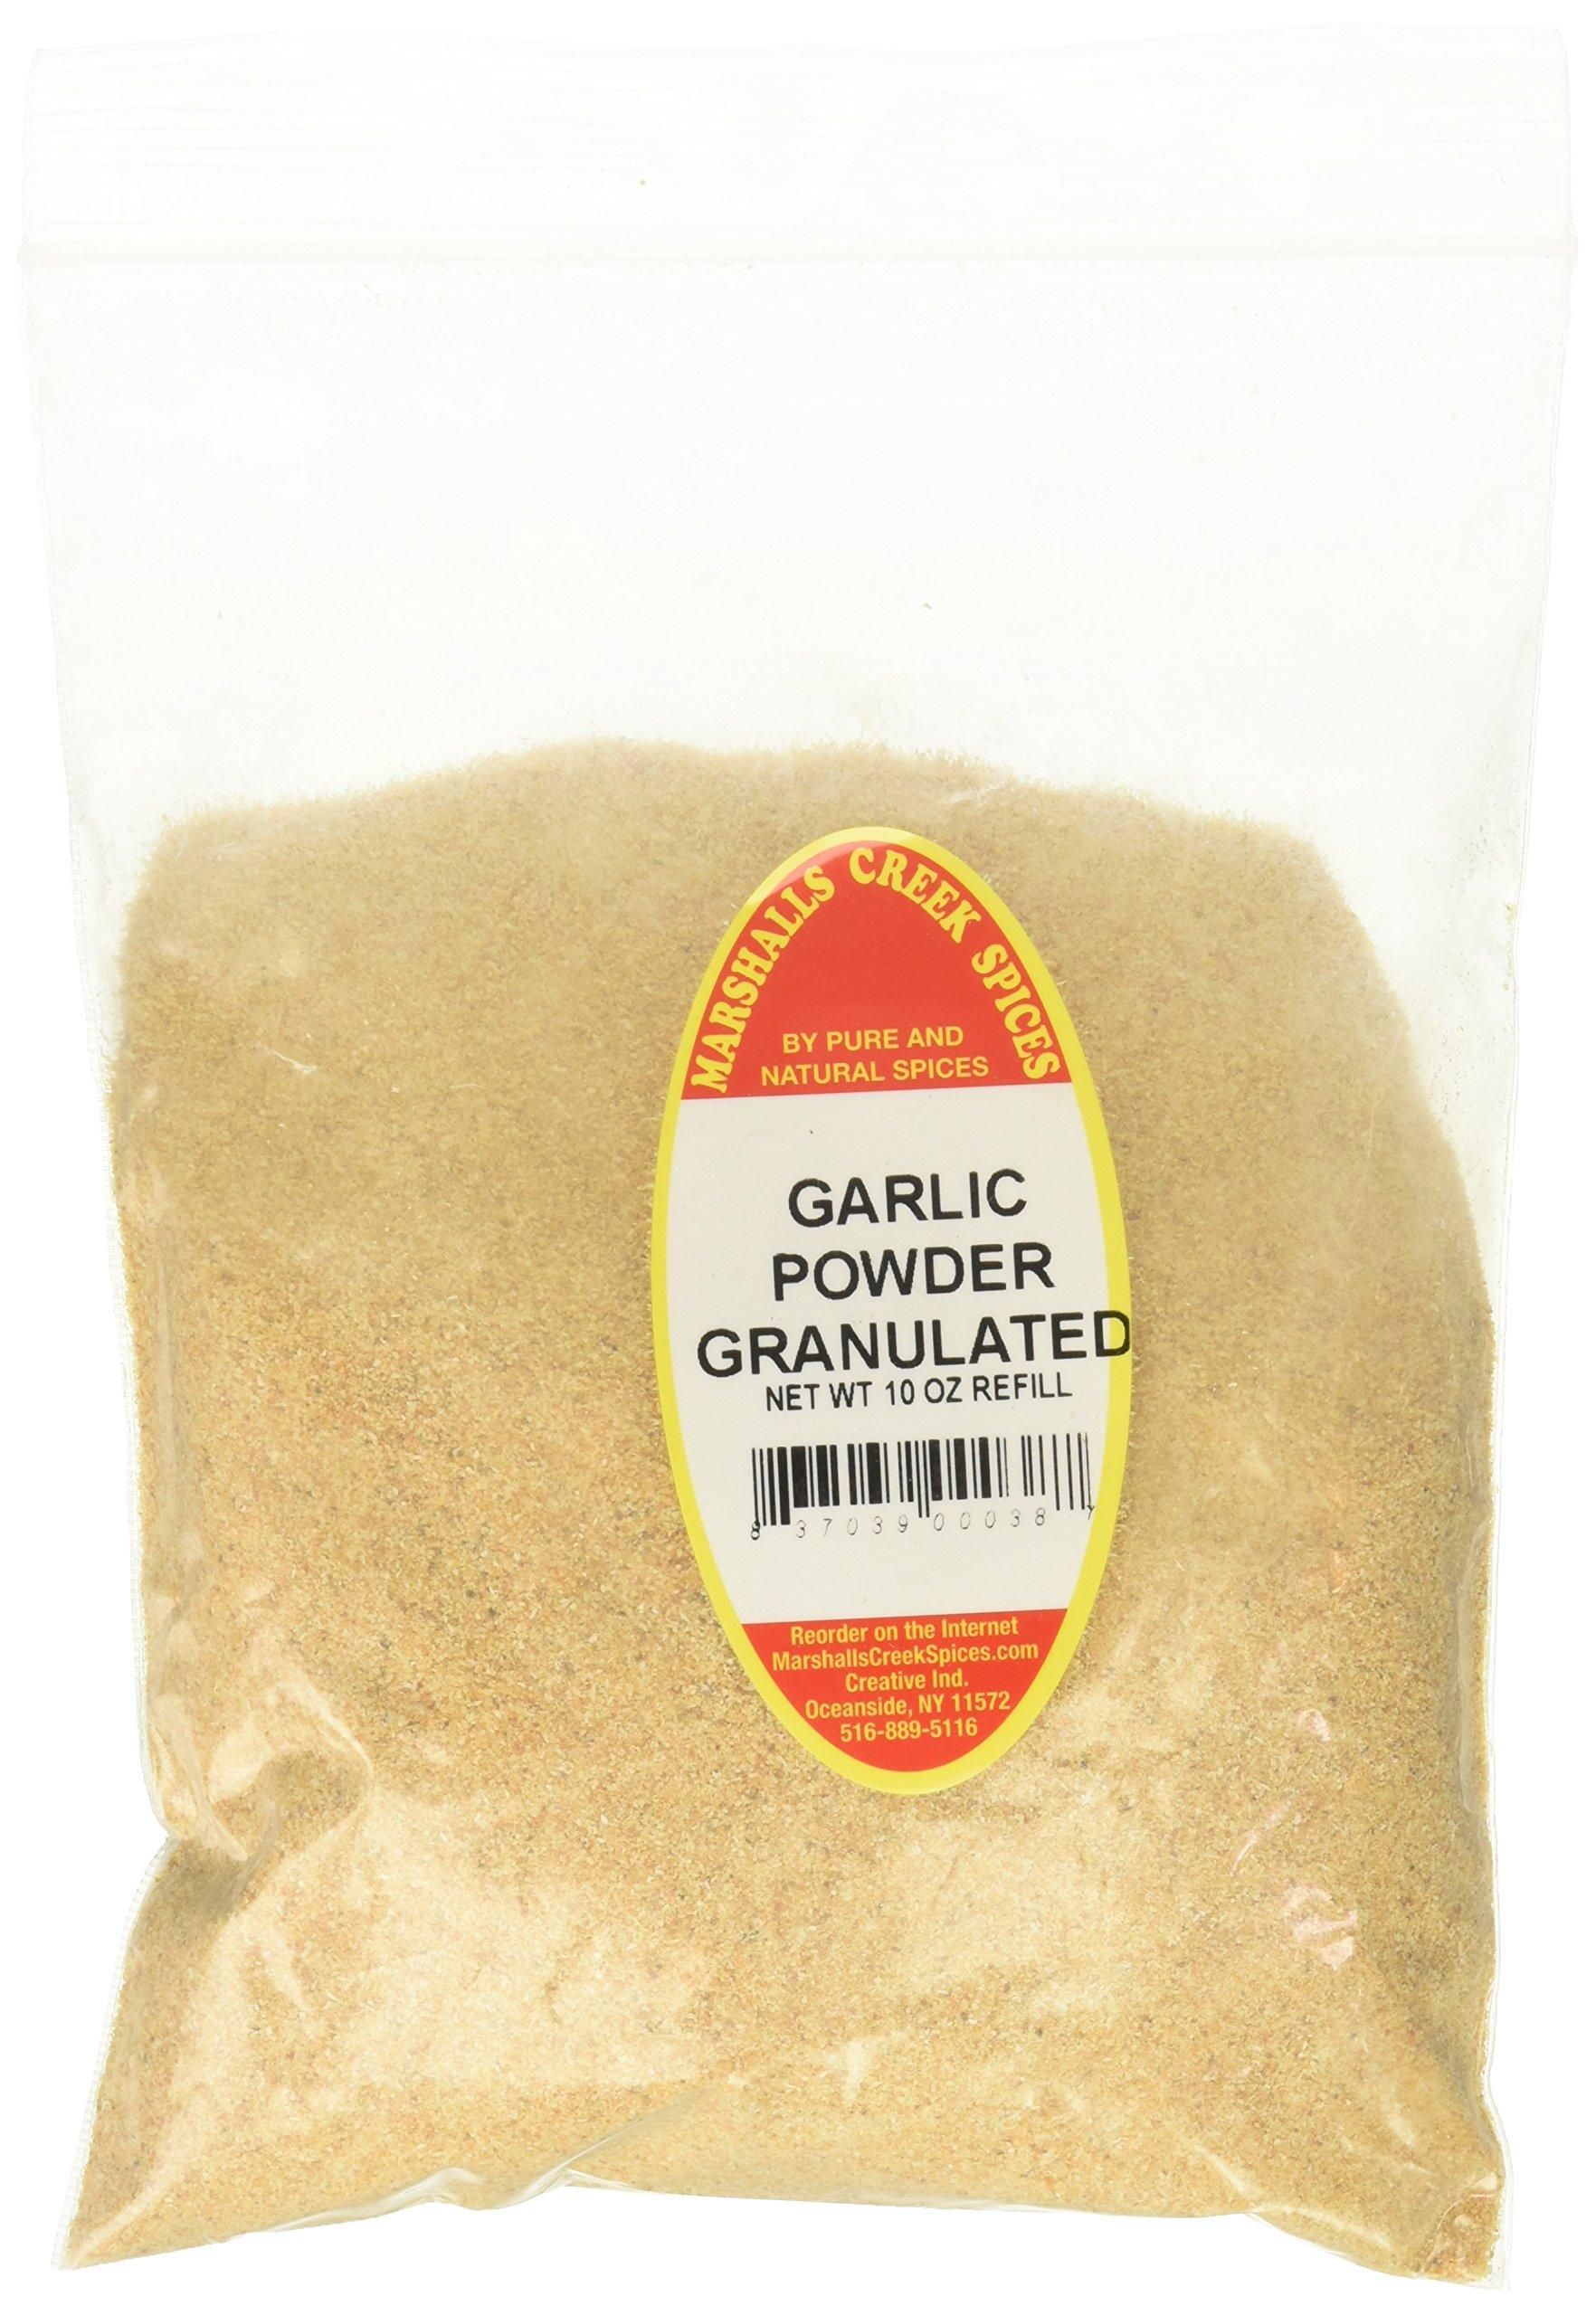 Marshalls Creek Kosher Spices GARLIC POWDER GRANULATED 10 oz